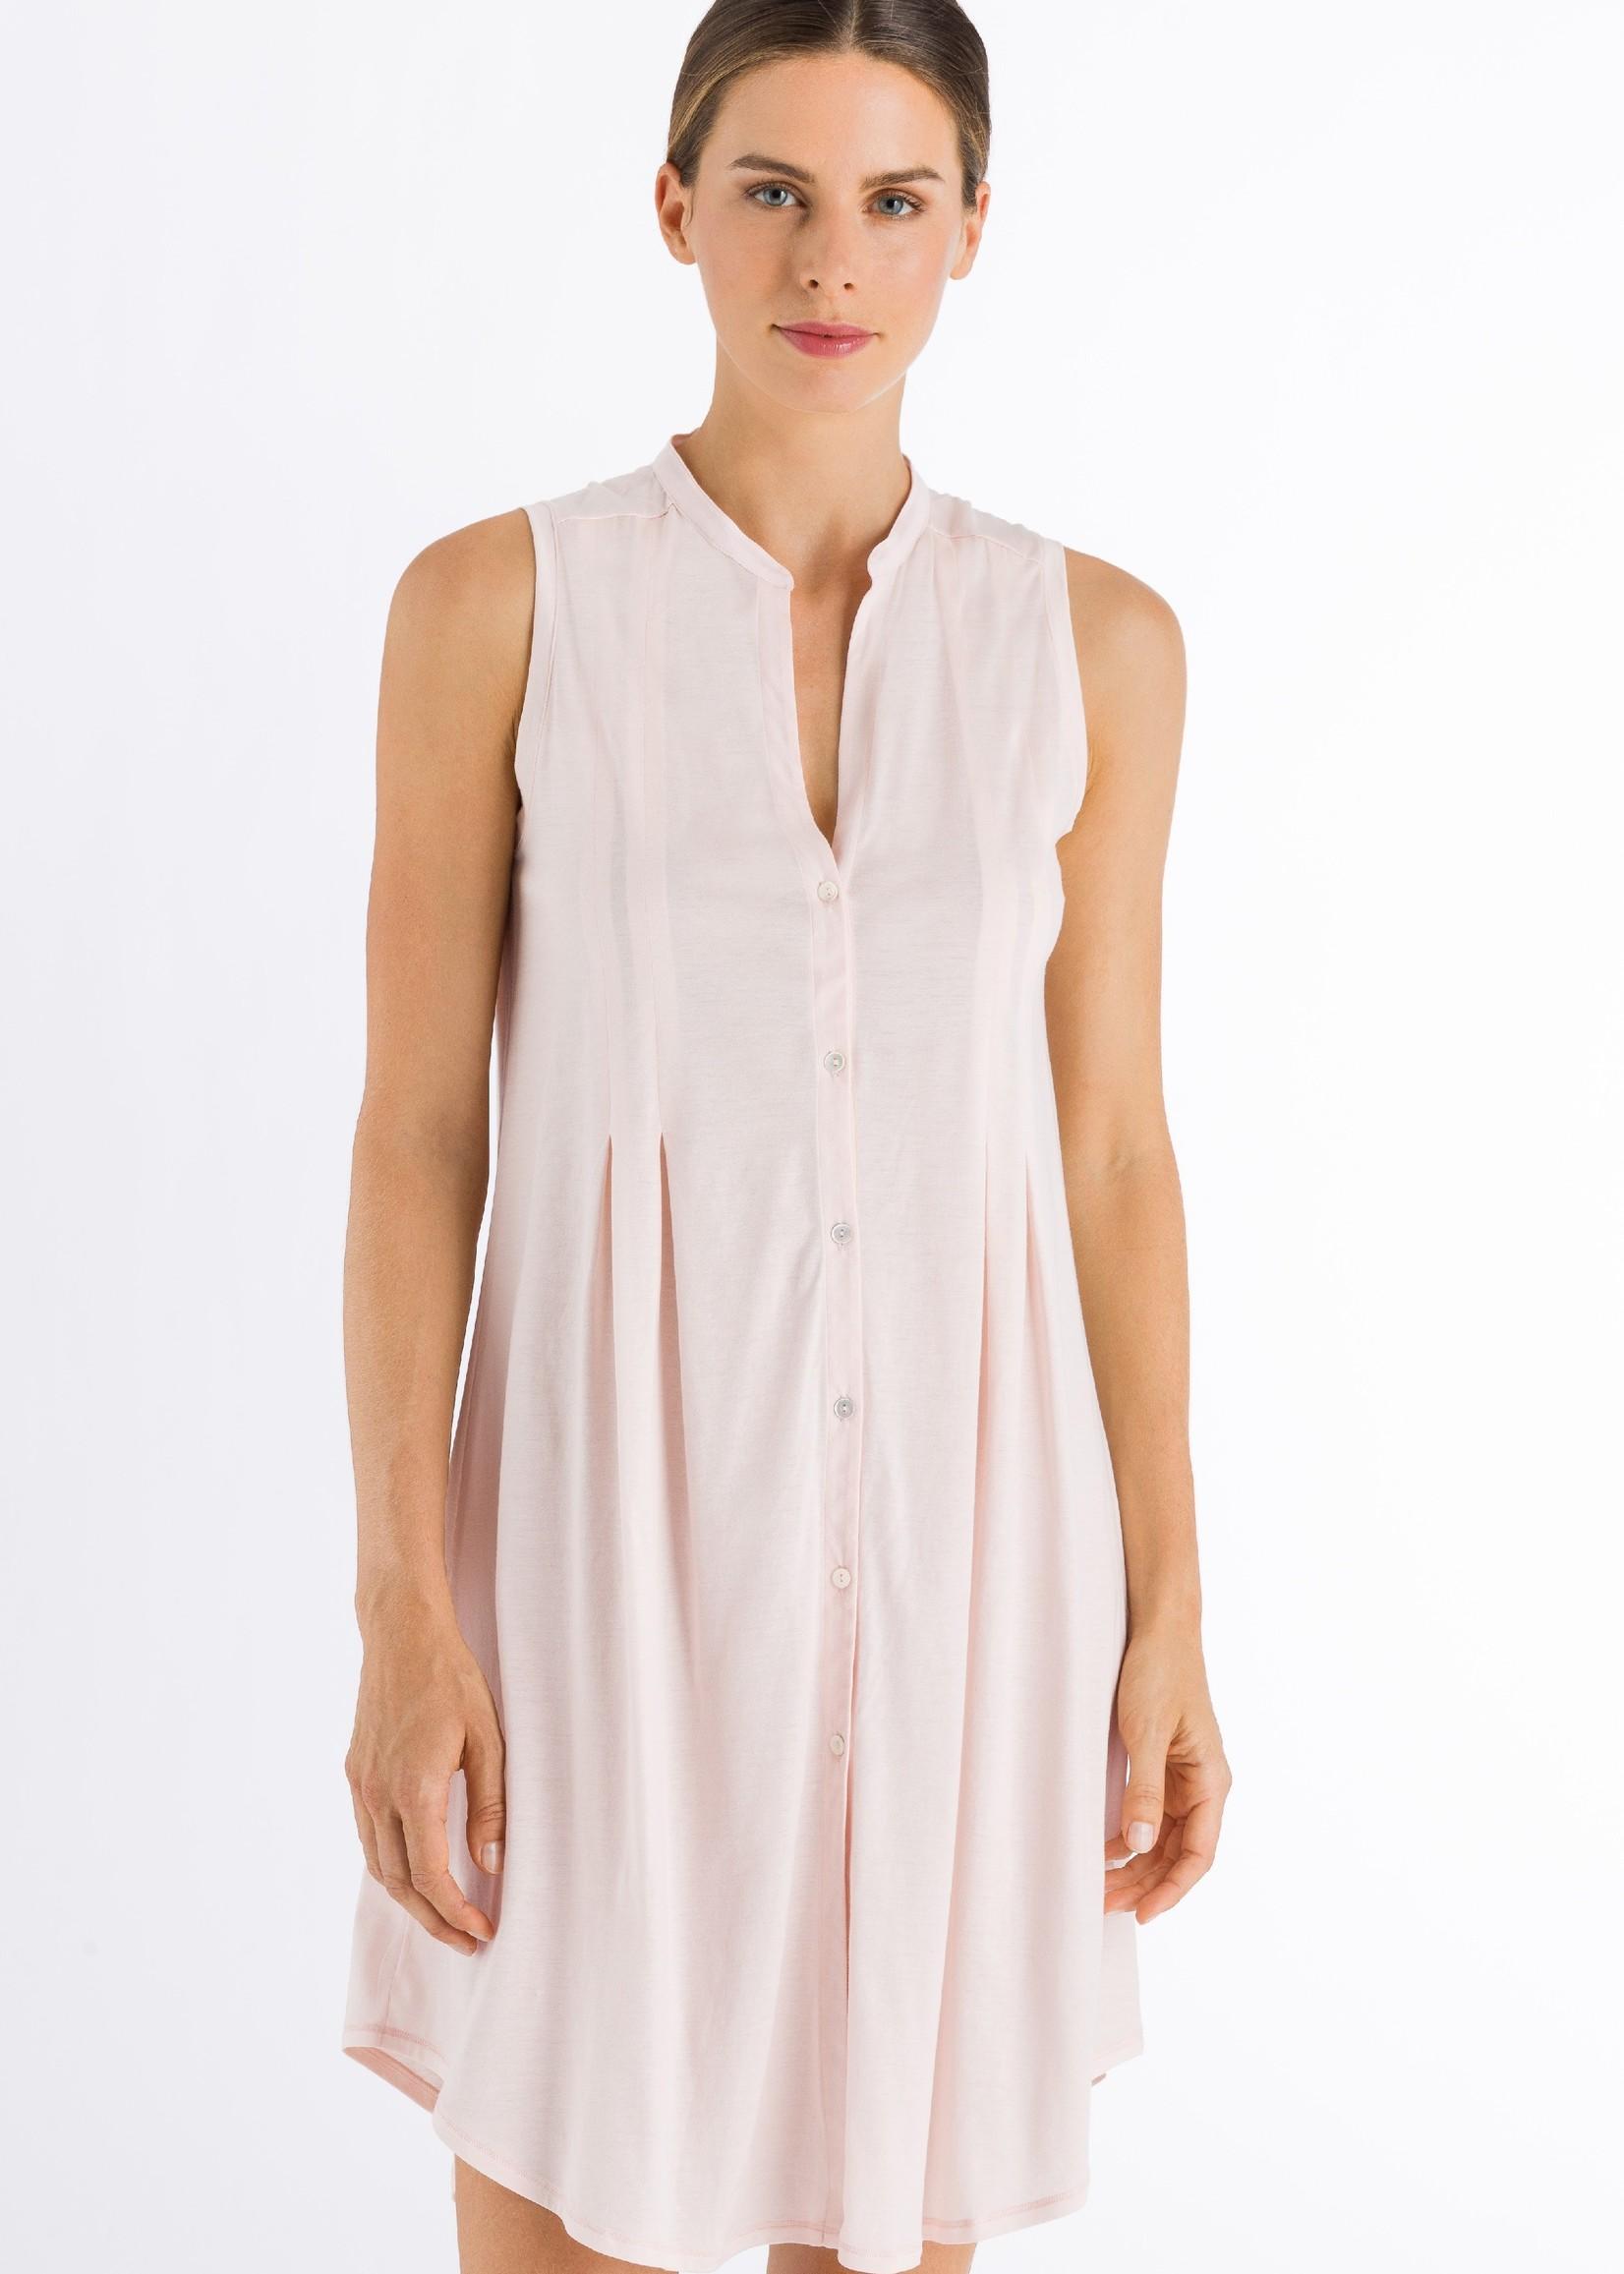 Hanro Cotton Deluxe Sleeveless Night Dress